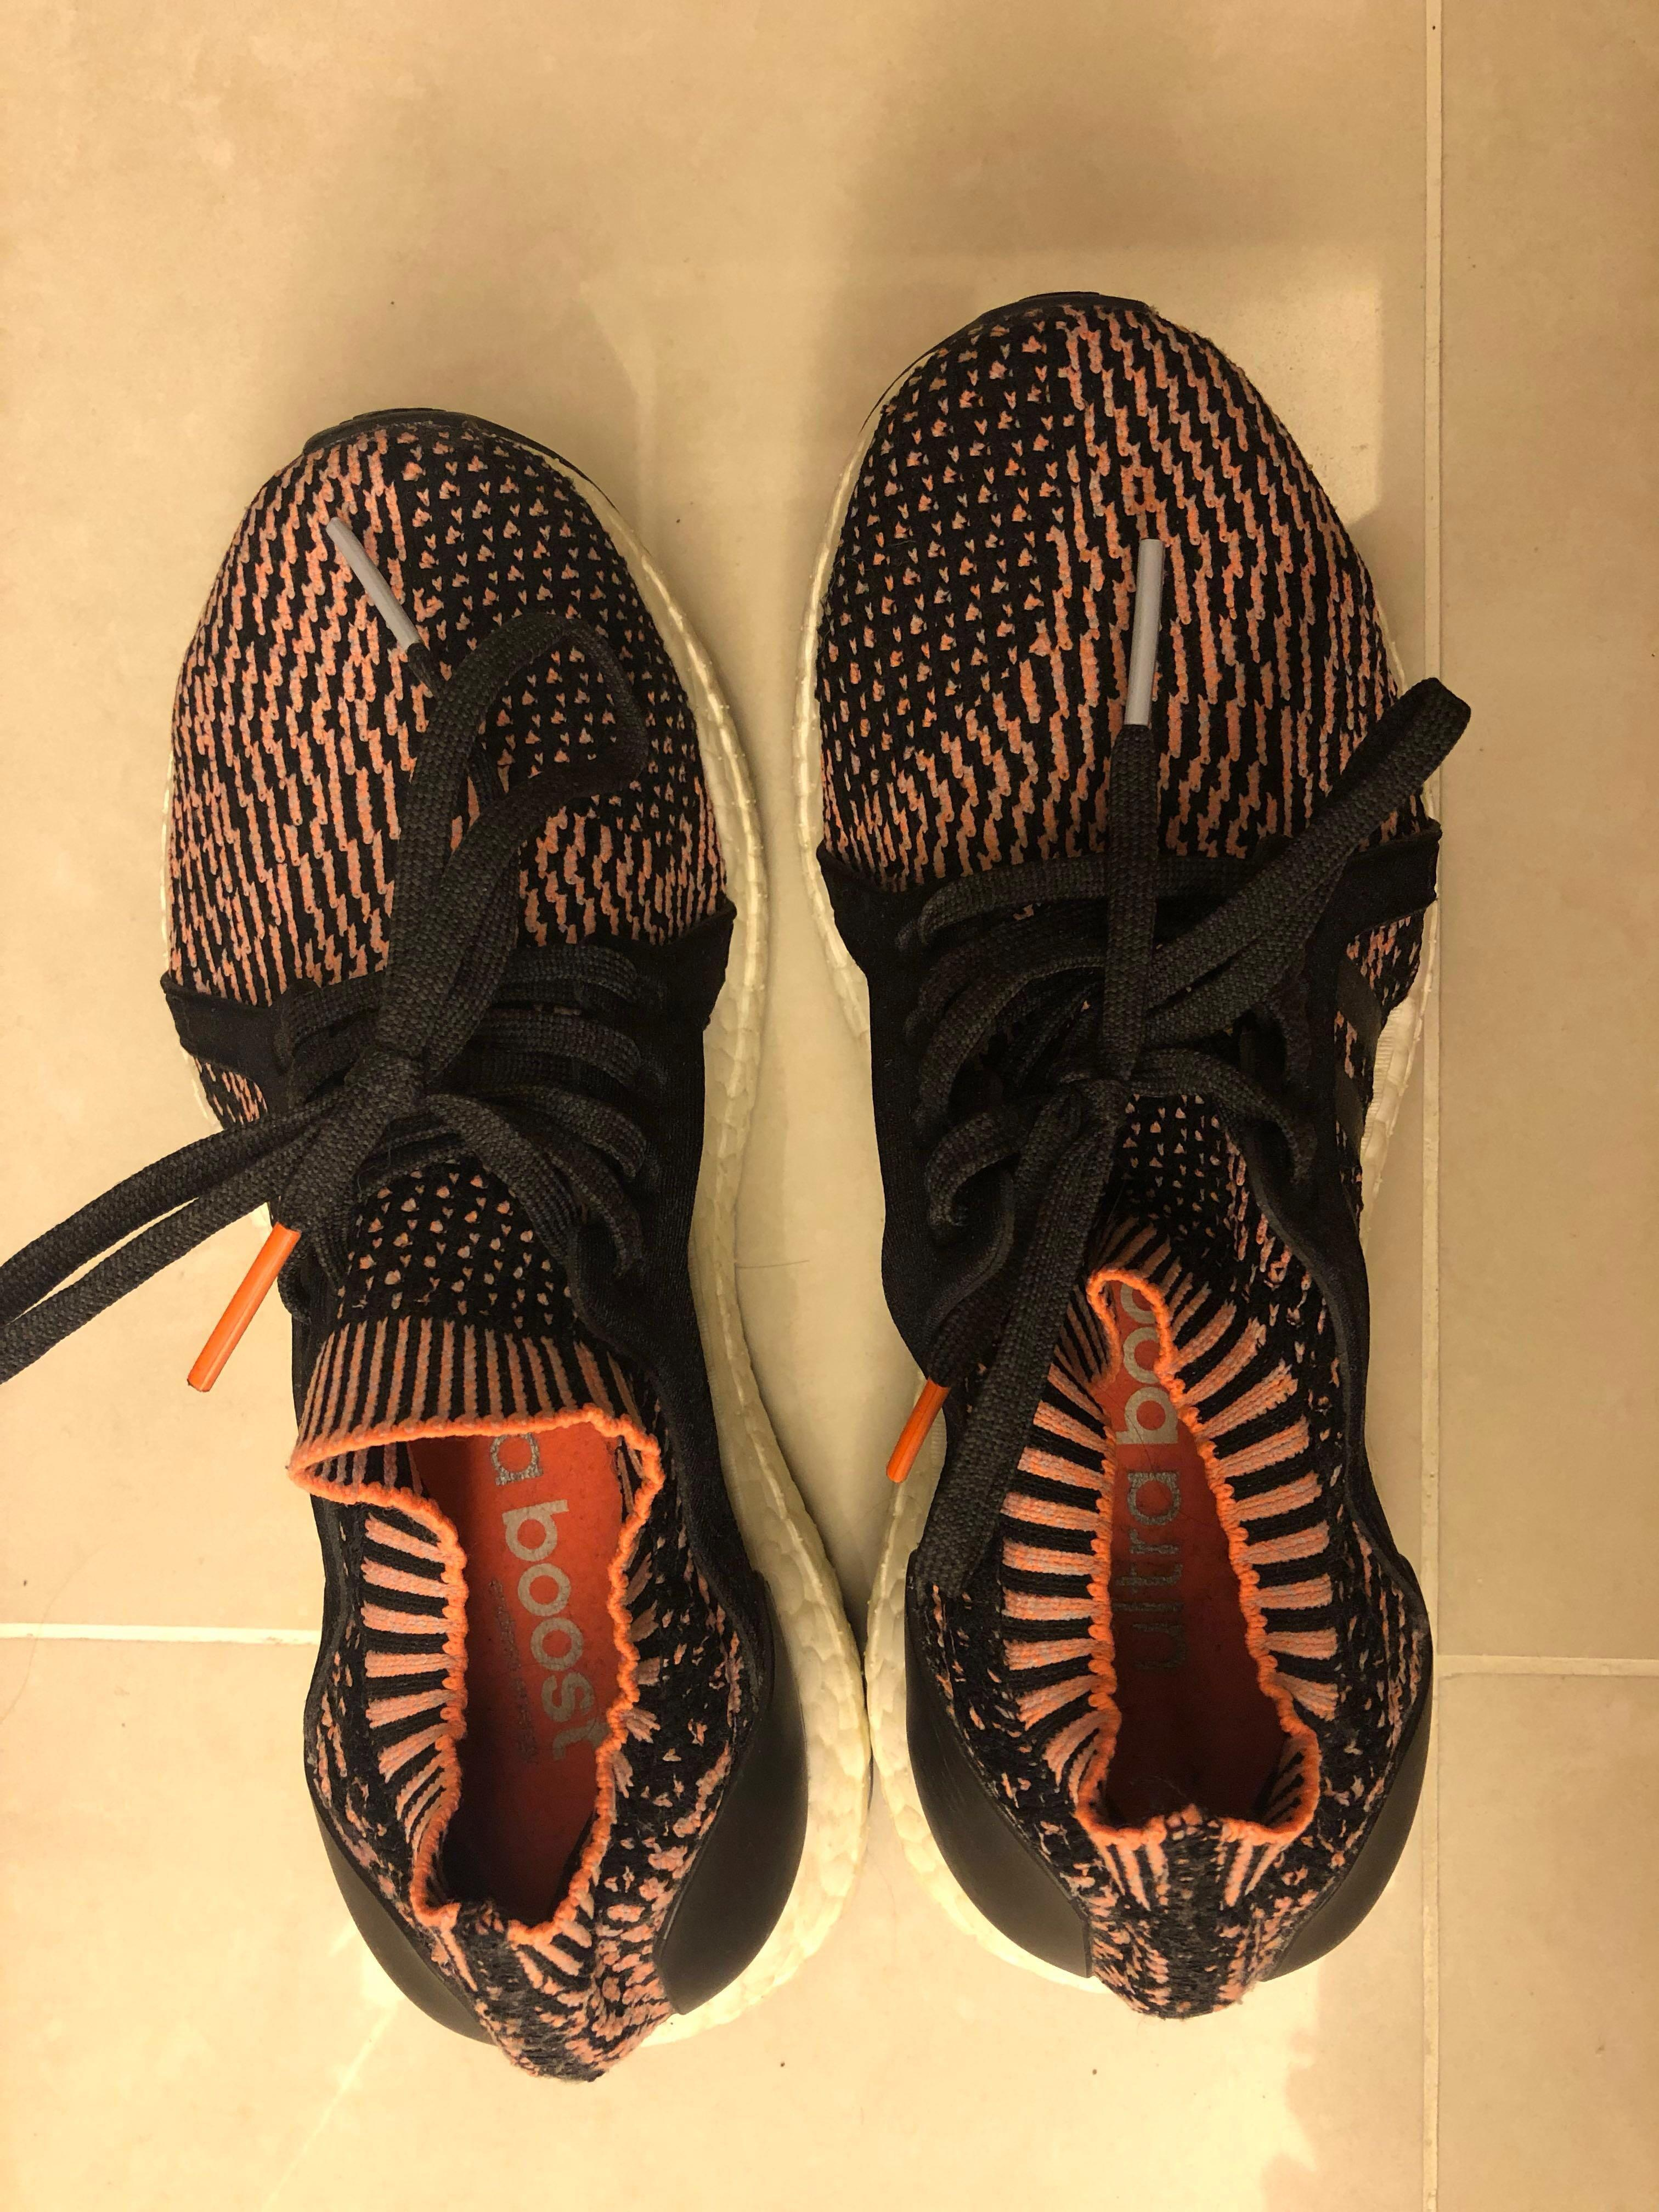 Adidas Ultra Boost sneakers (black/orange)